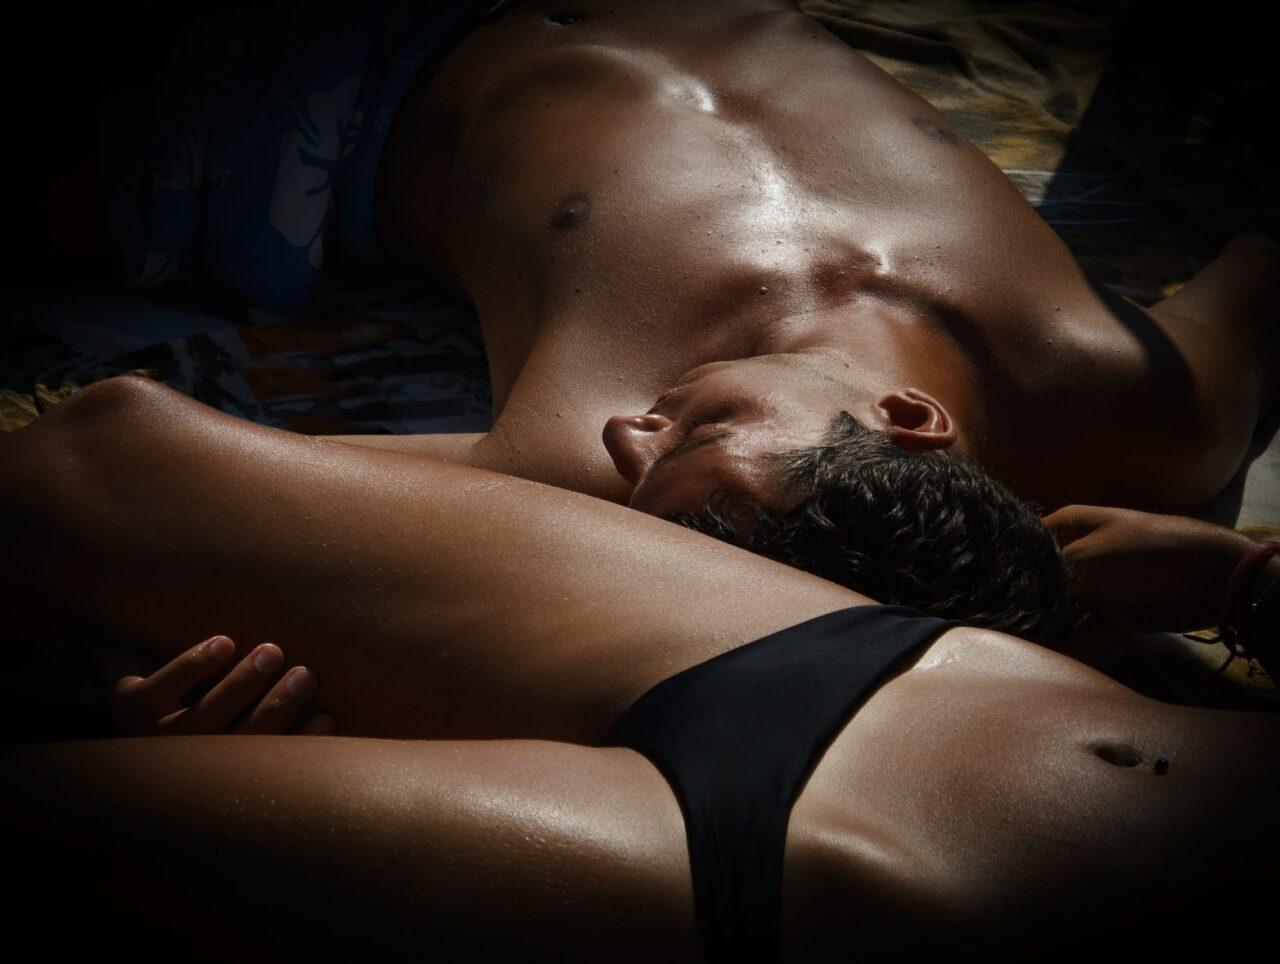 Will Having More Sex Make Me Happier?